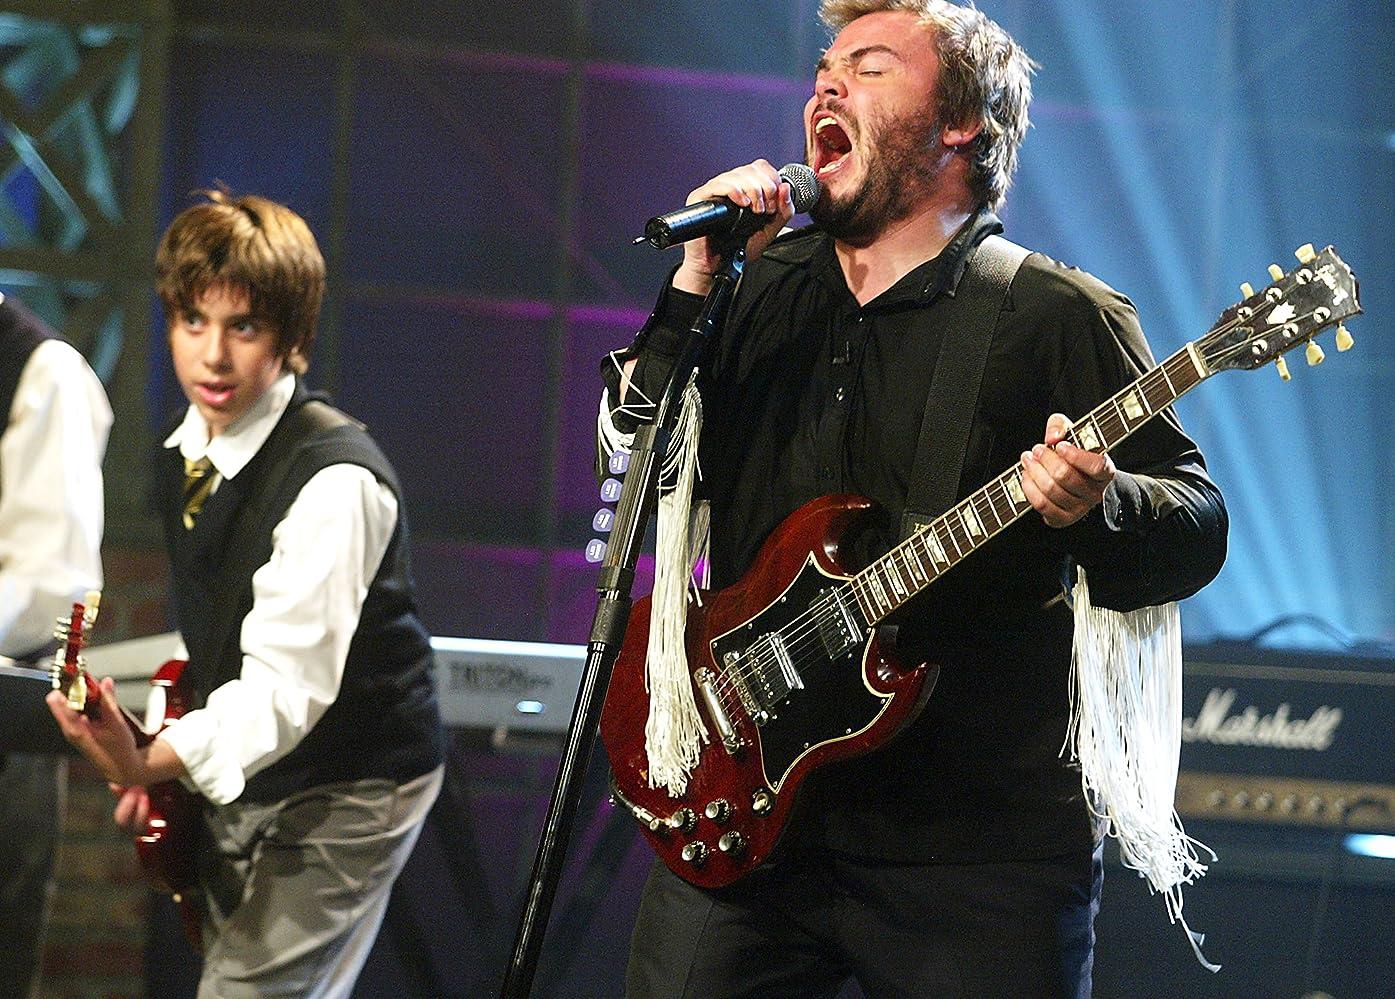 1991 : Joey Gaedos, Jr. Born, School of Rock Guitarist